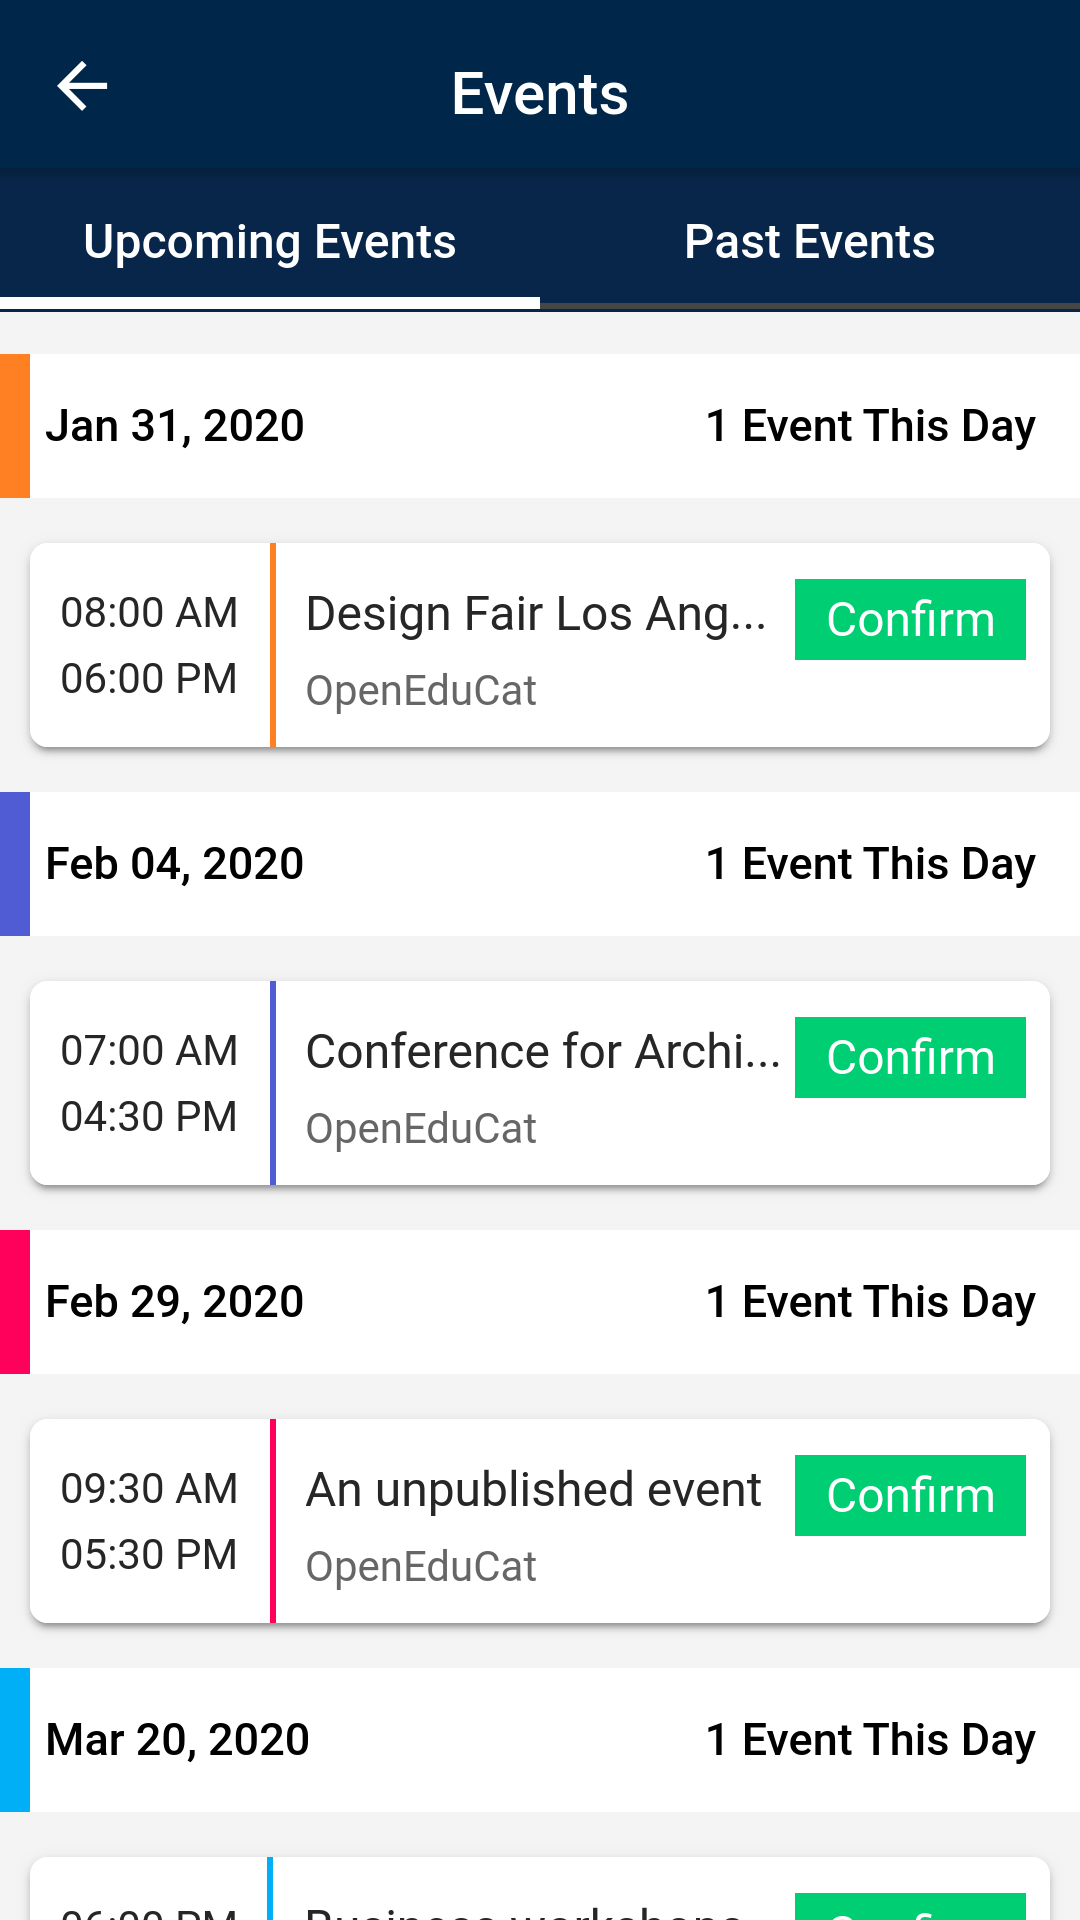 OpenEduCat events